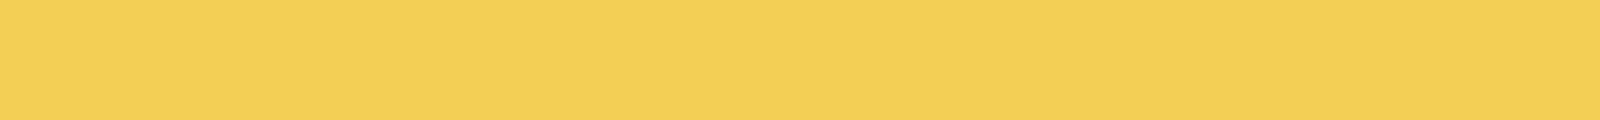 Primrose banner.jpg